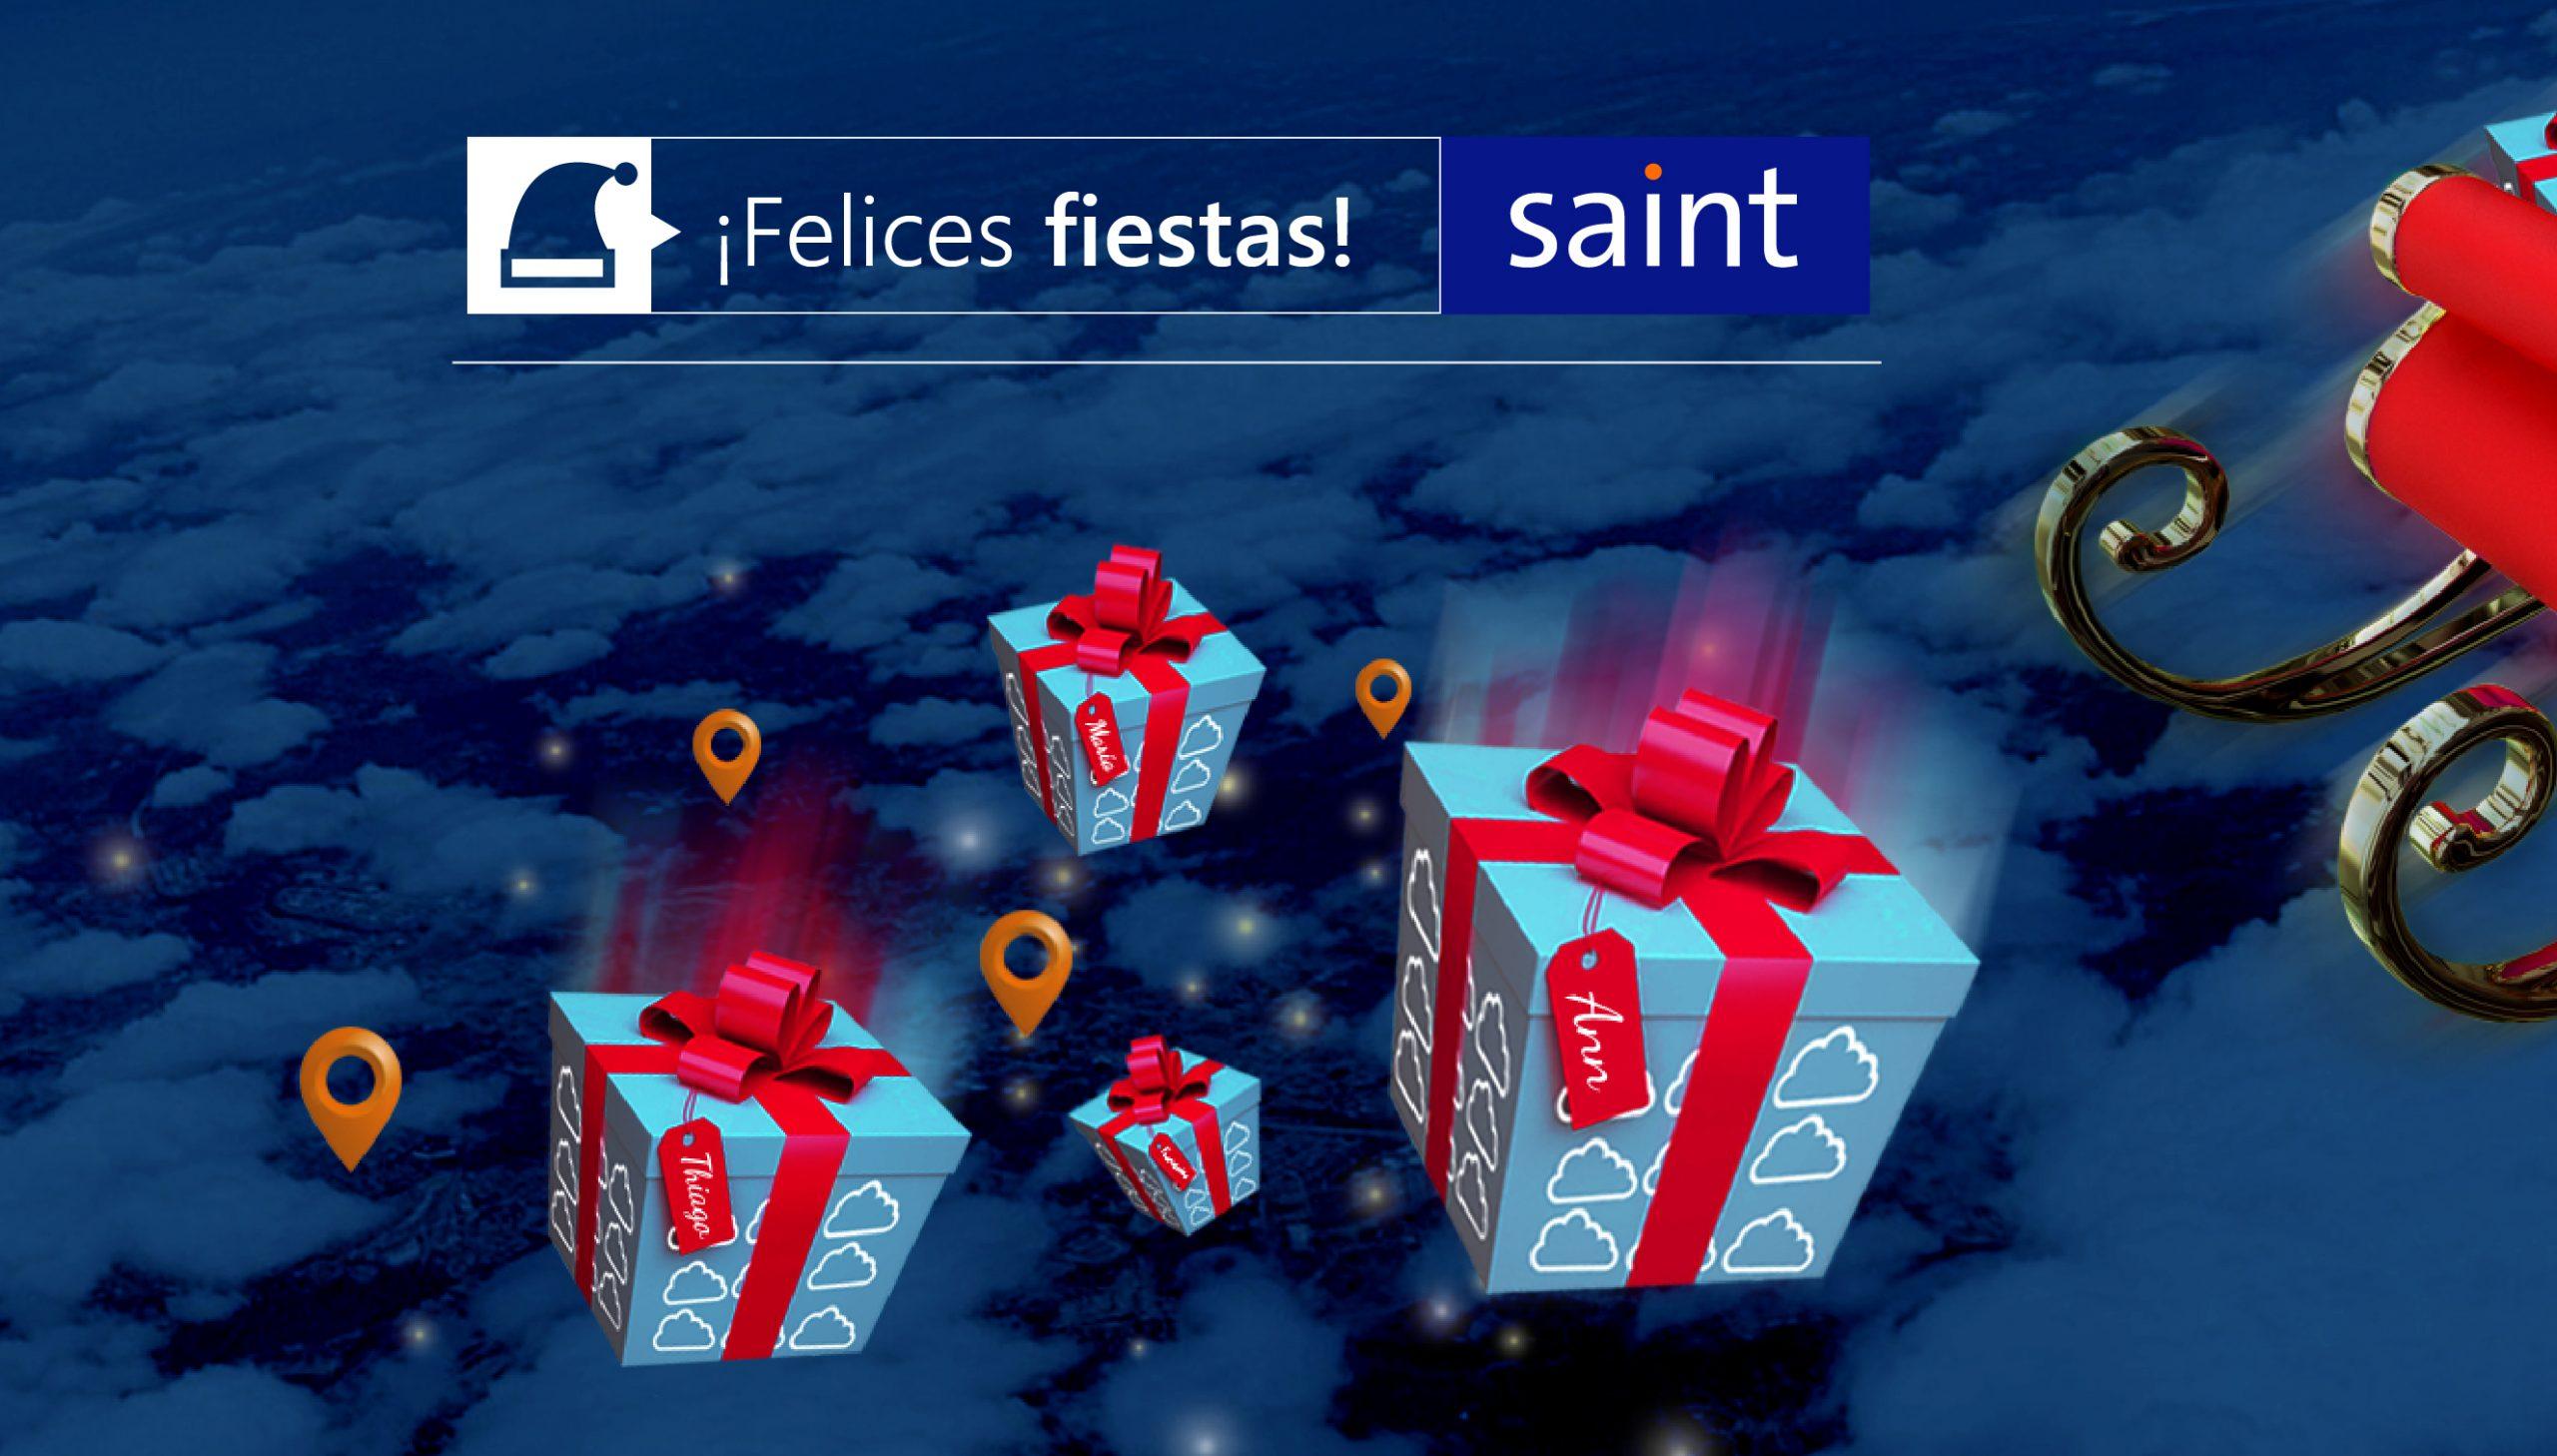 Felices fiestas 2019 les desea saint casa Matriz